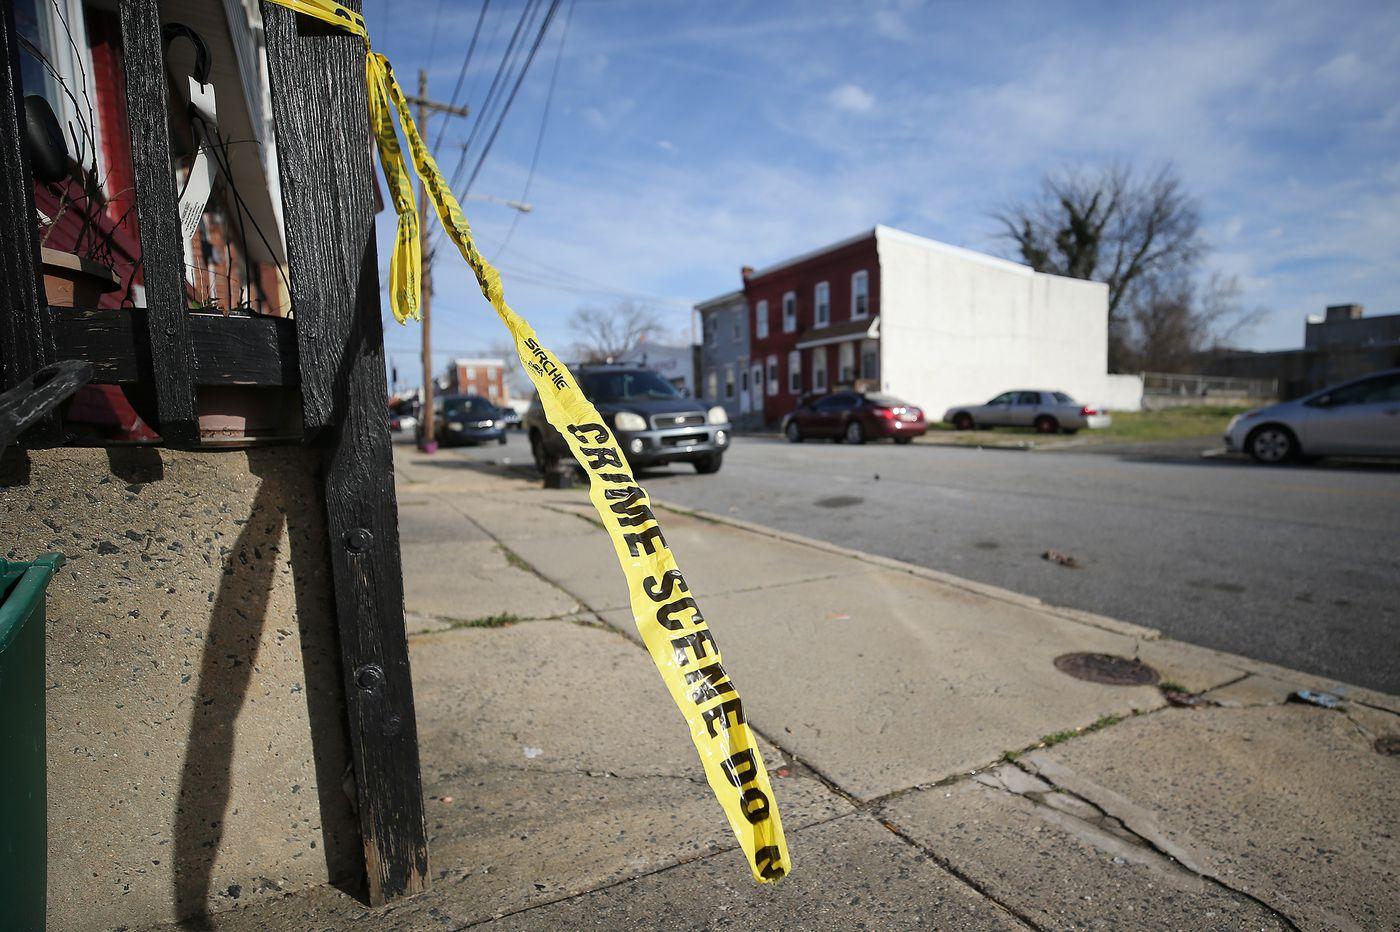 Teen shot through the window while asleep in East Germantown home